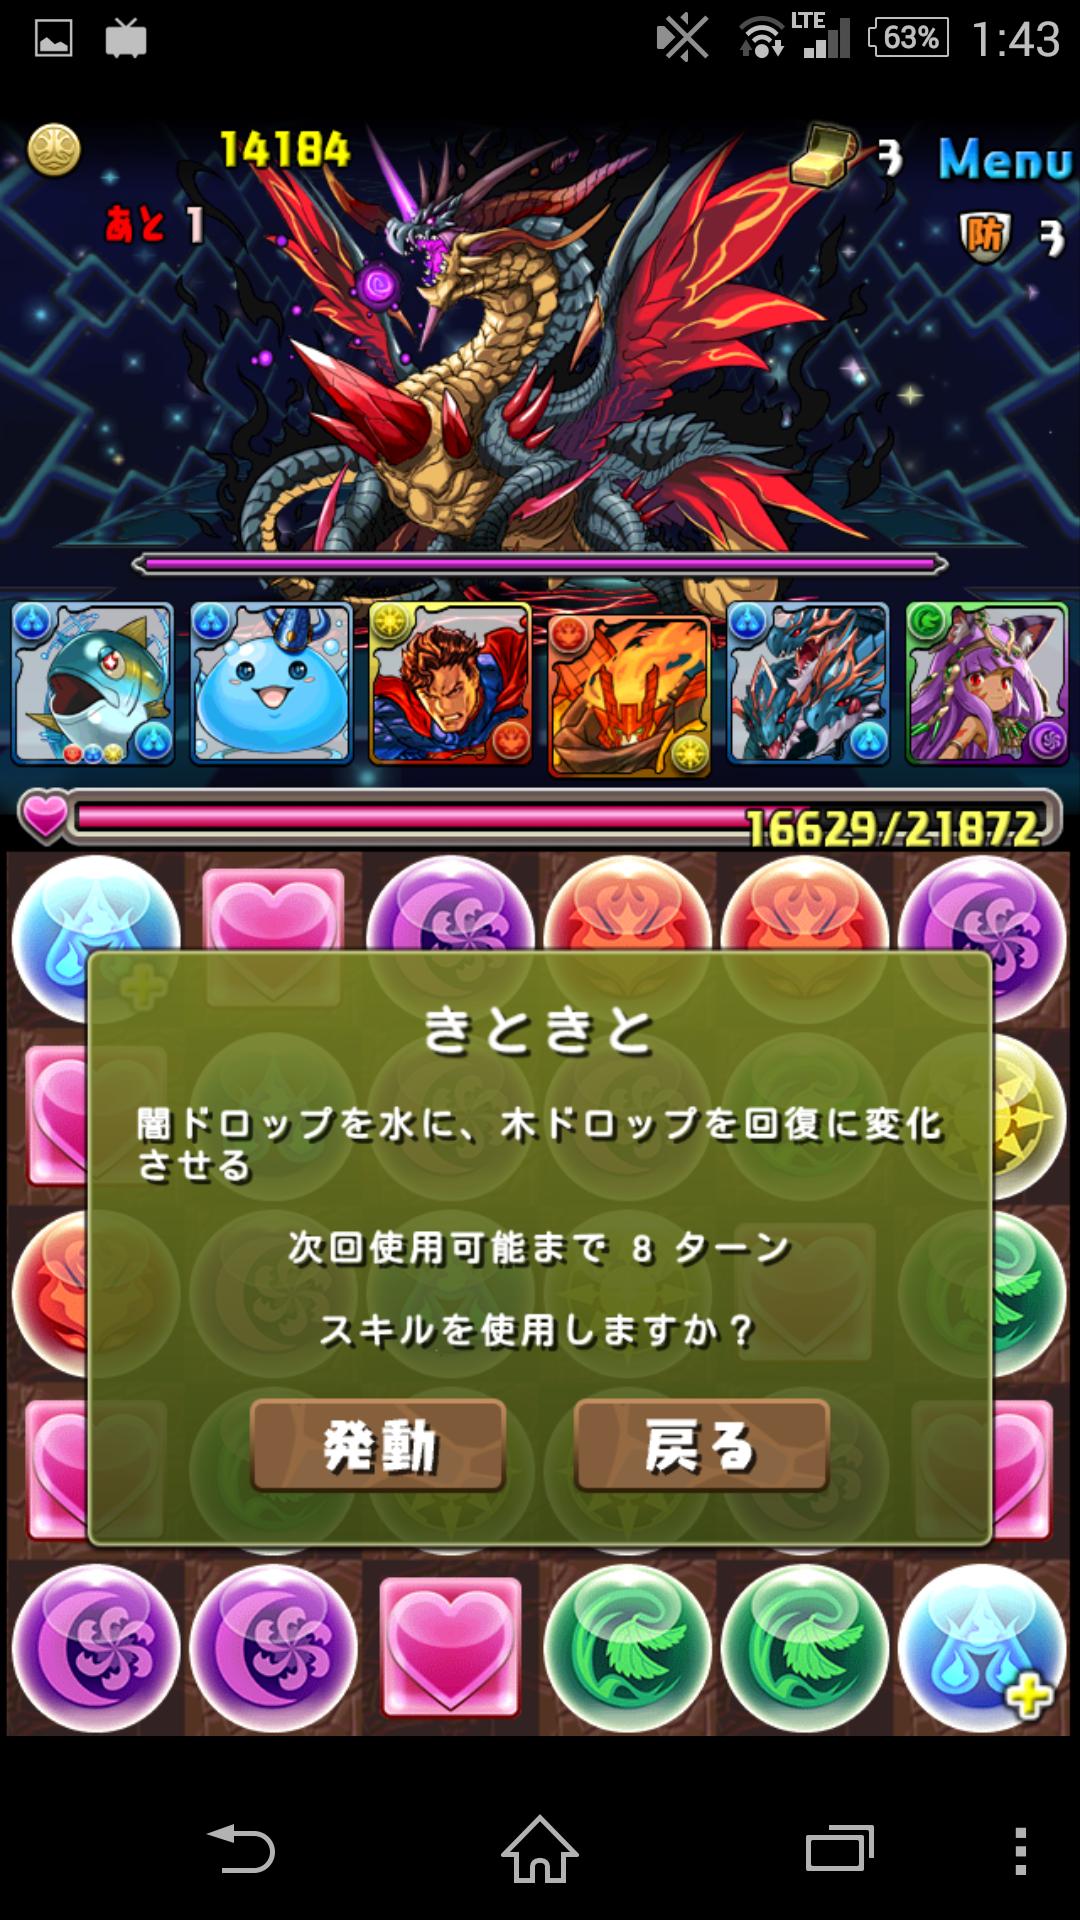 Screenshot_2014-11-13-01-43-48.png